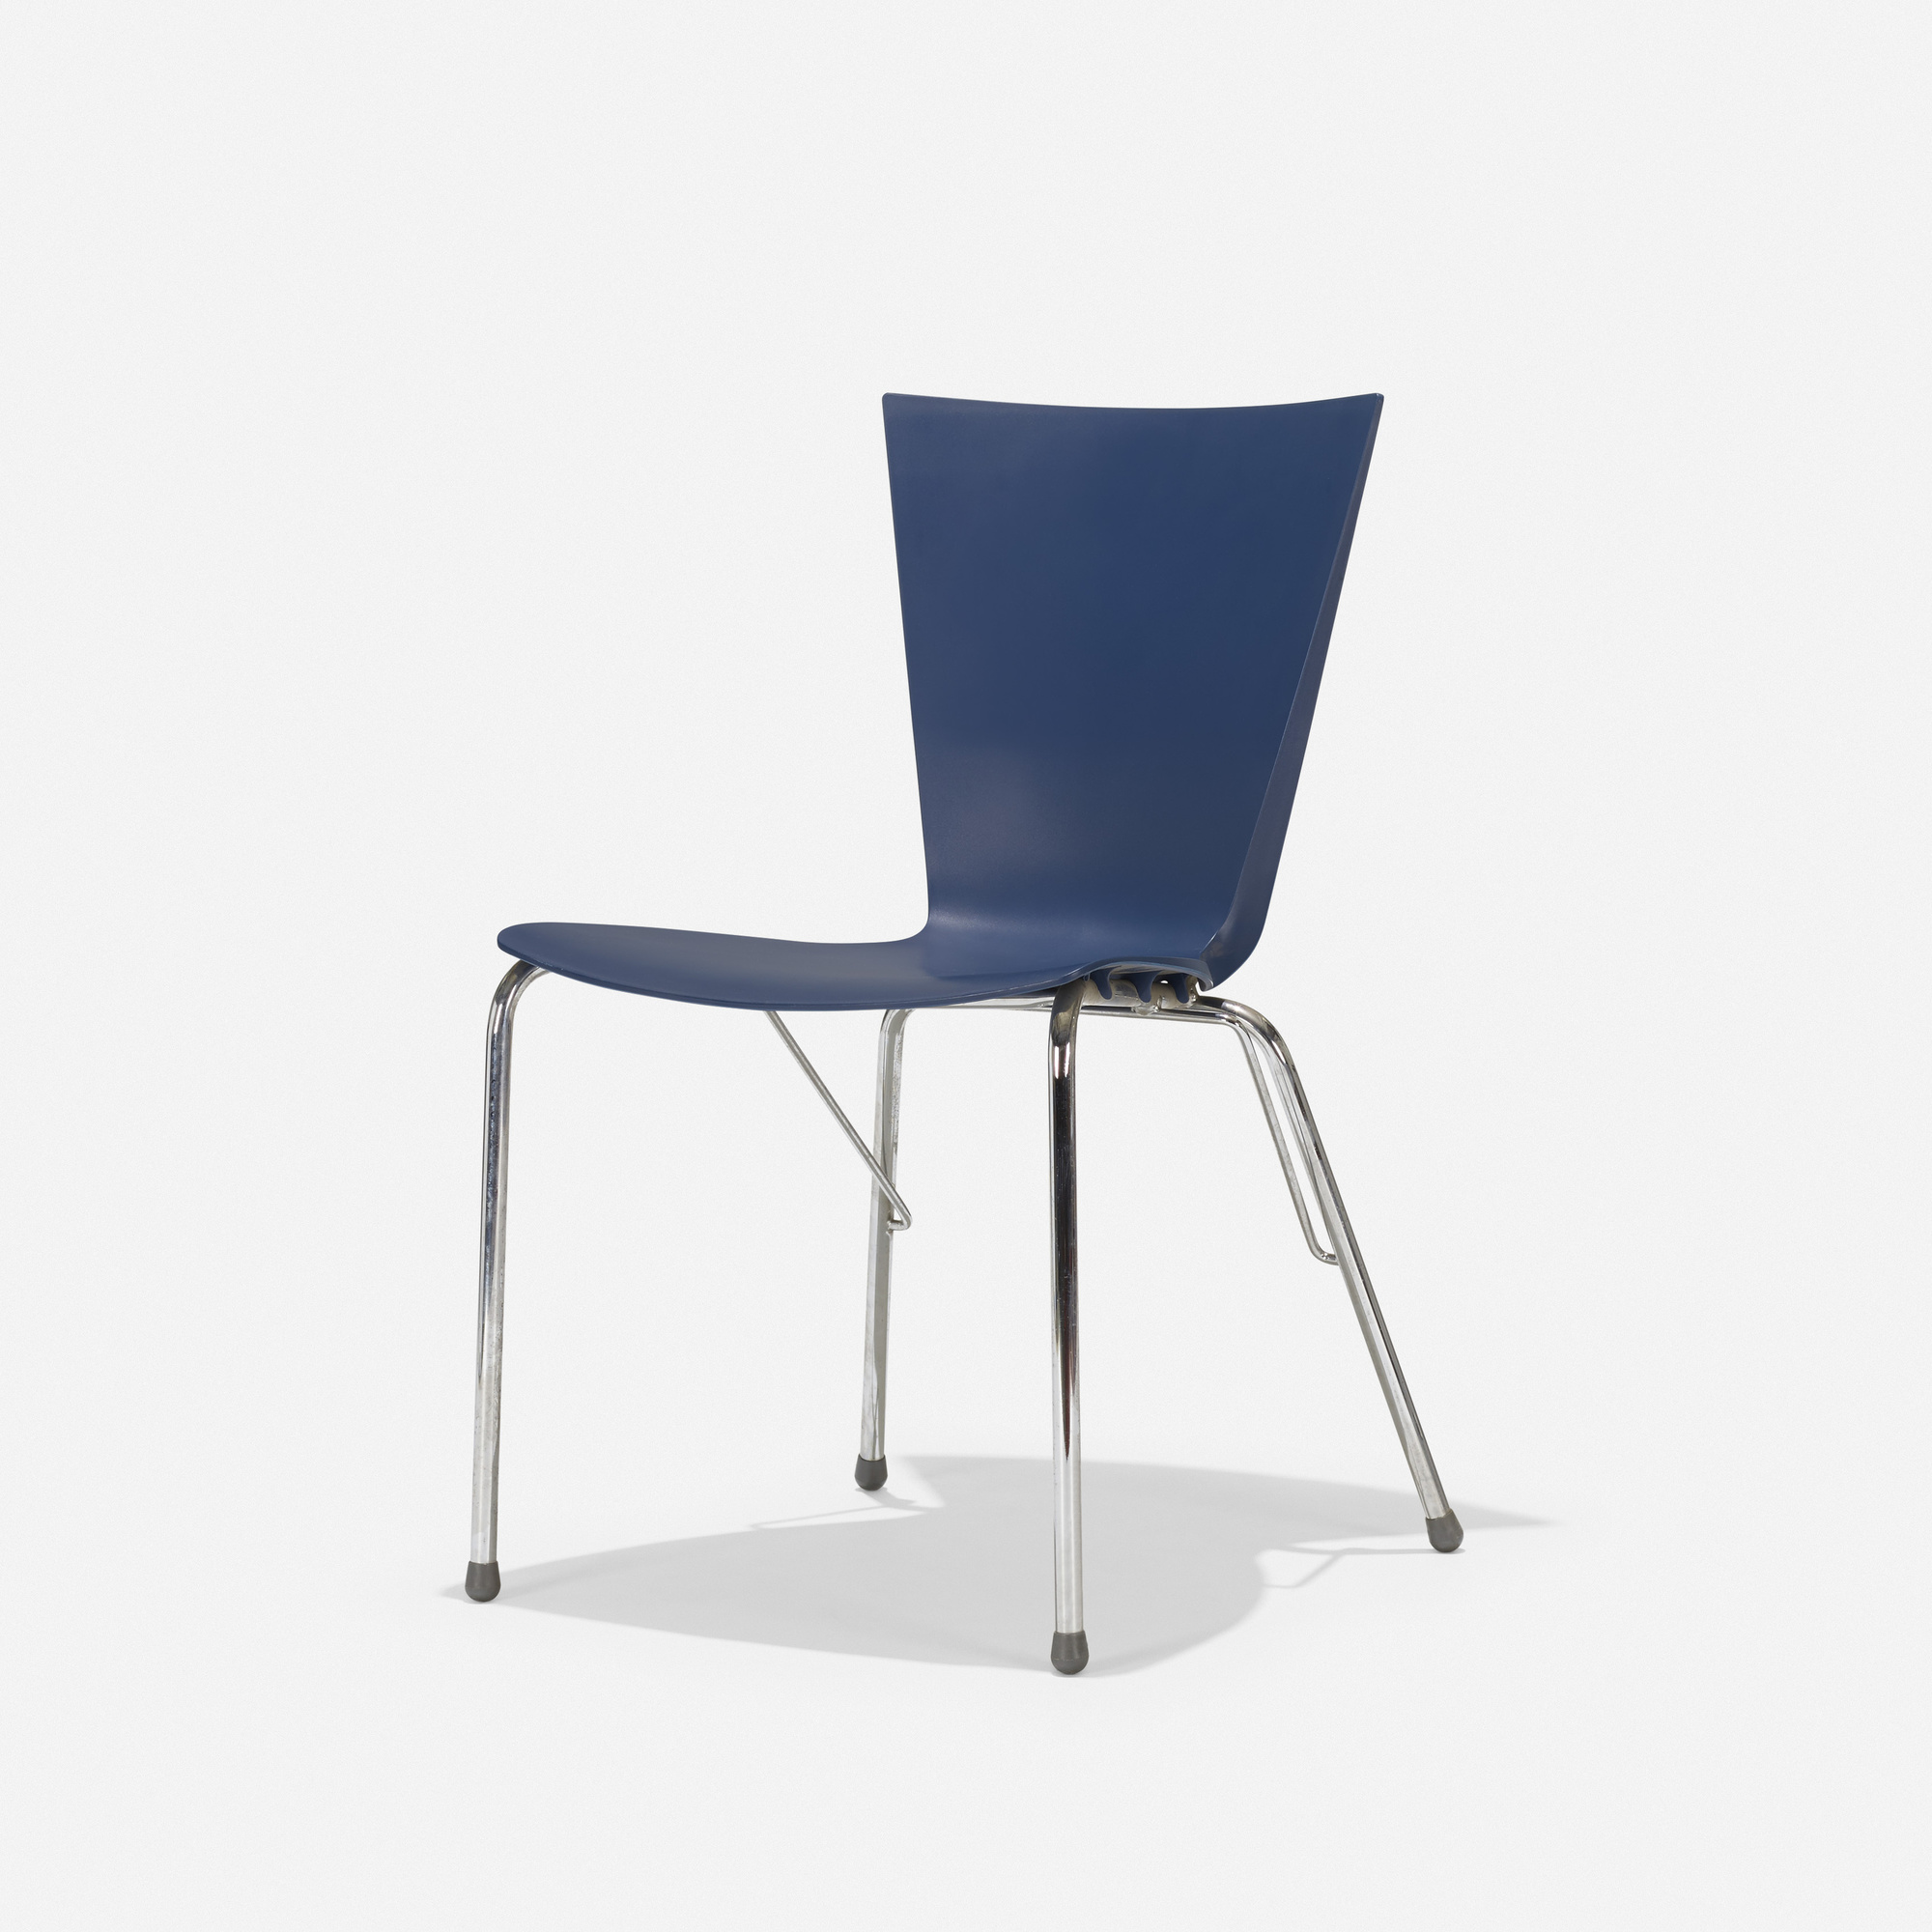 102: Carlo Bartoli / Storm chair (1 of 3)